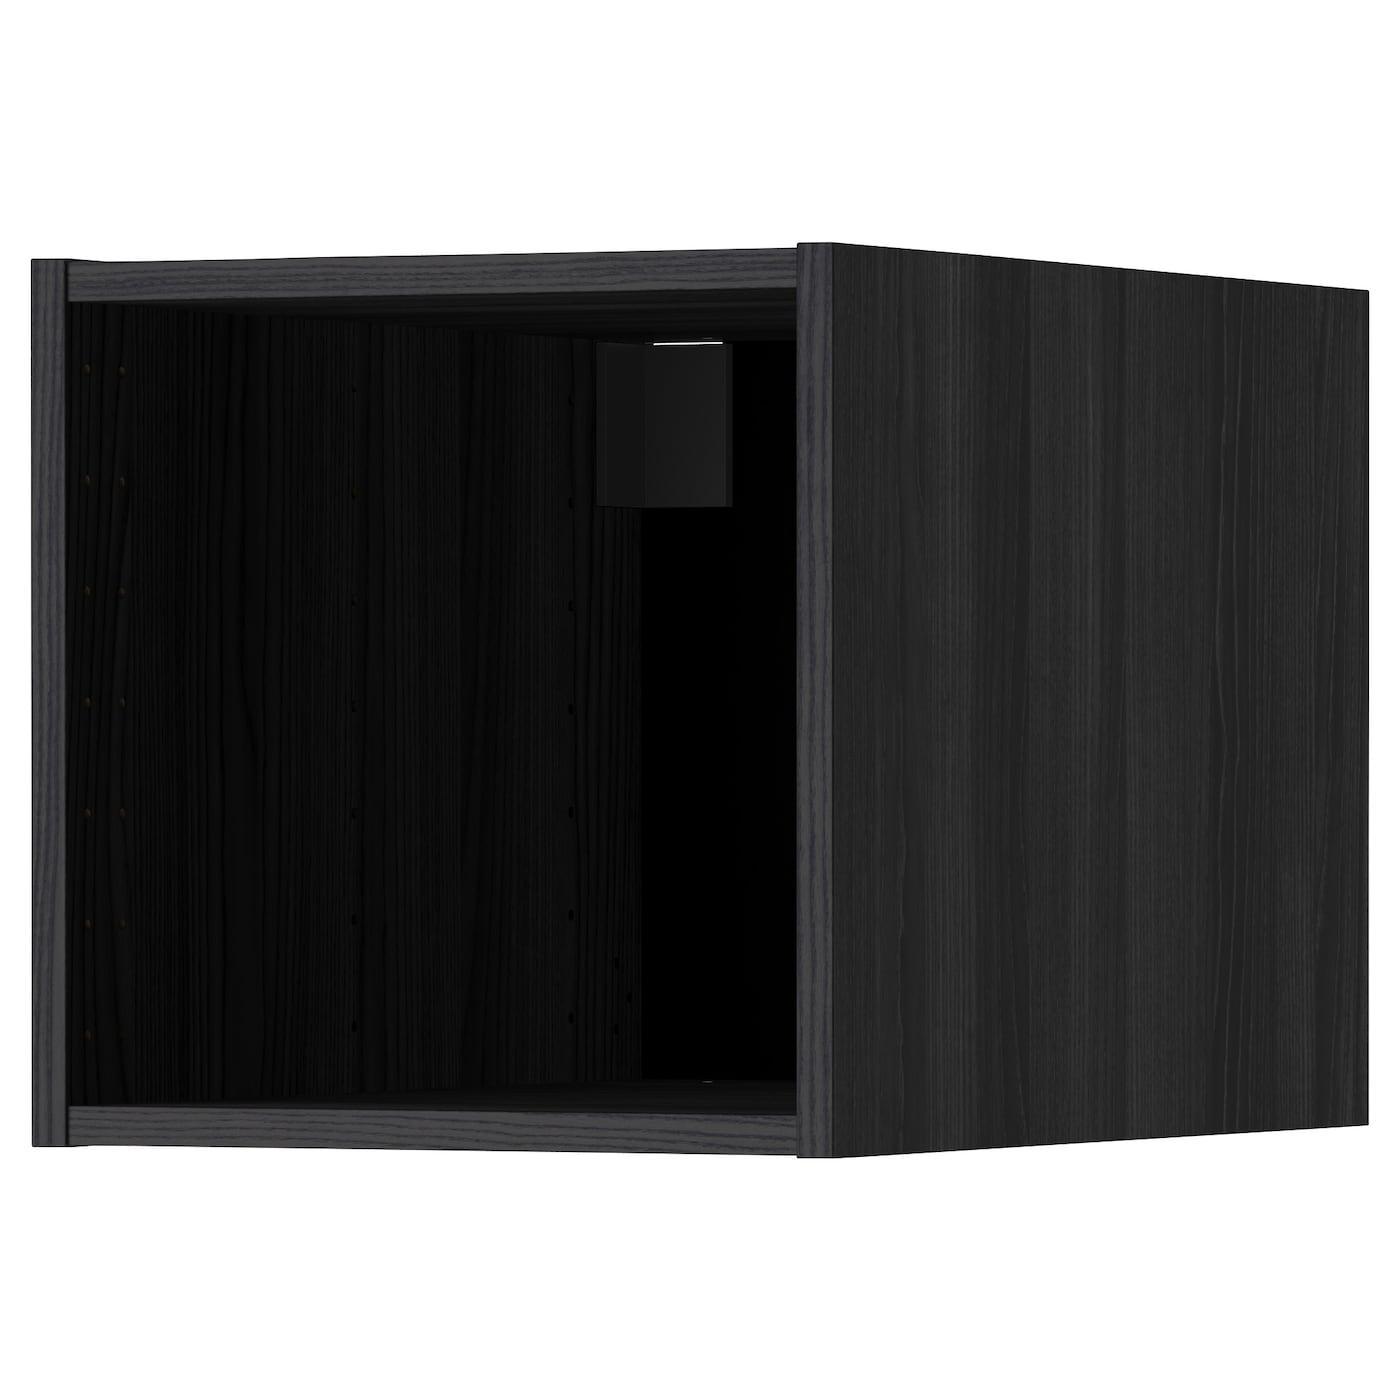 METOD, Oberschrank, schwarz 502.240.74